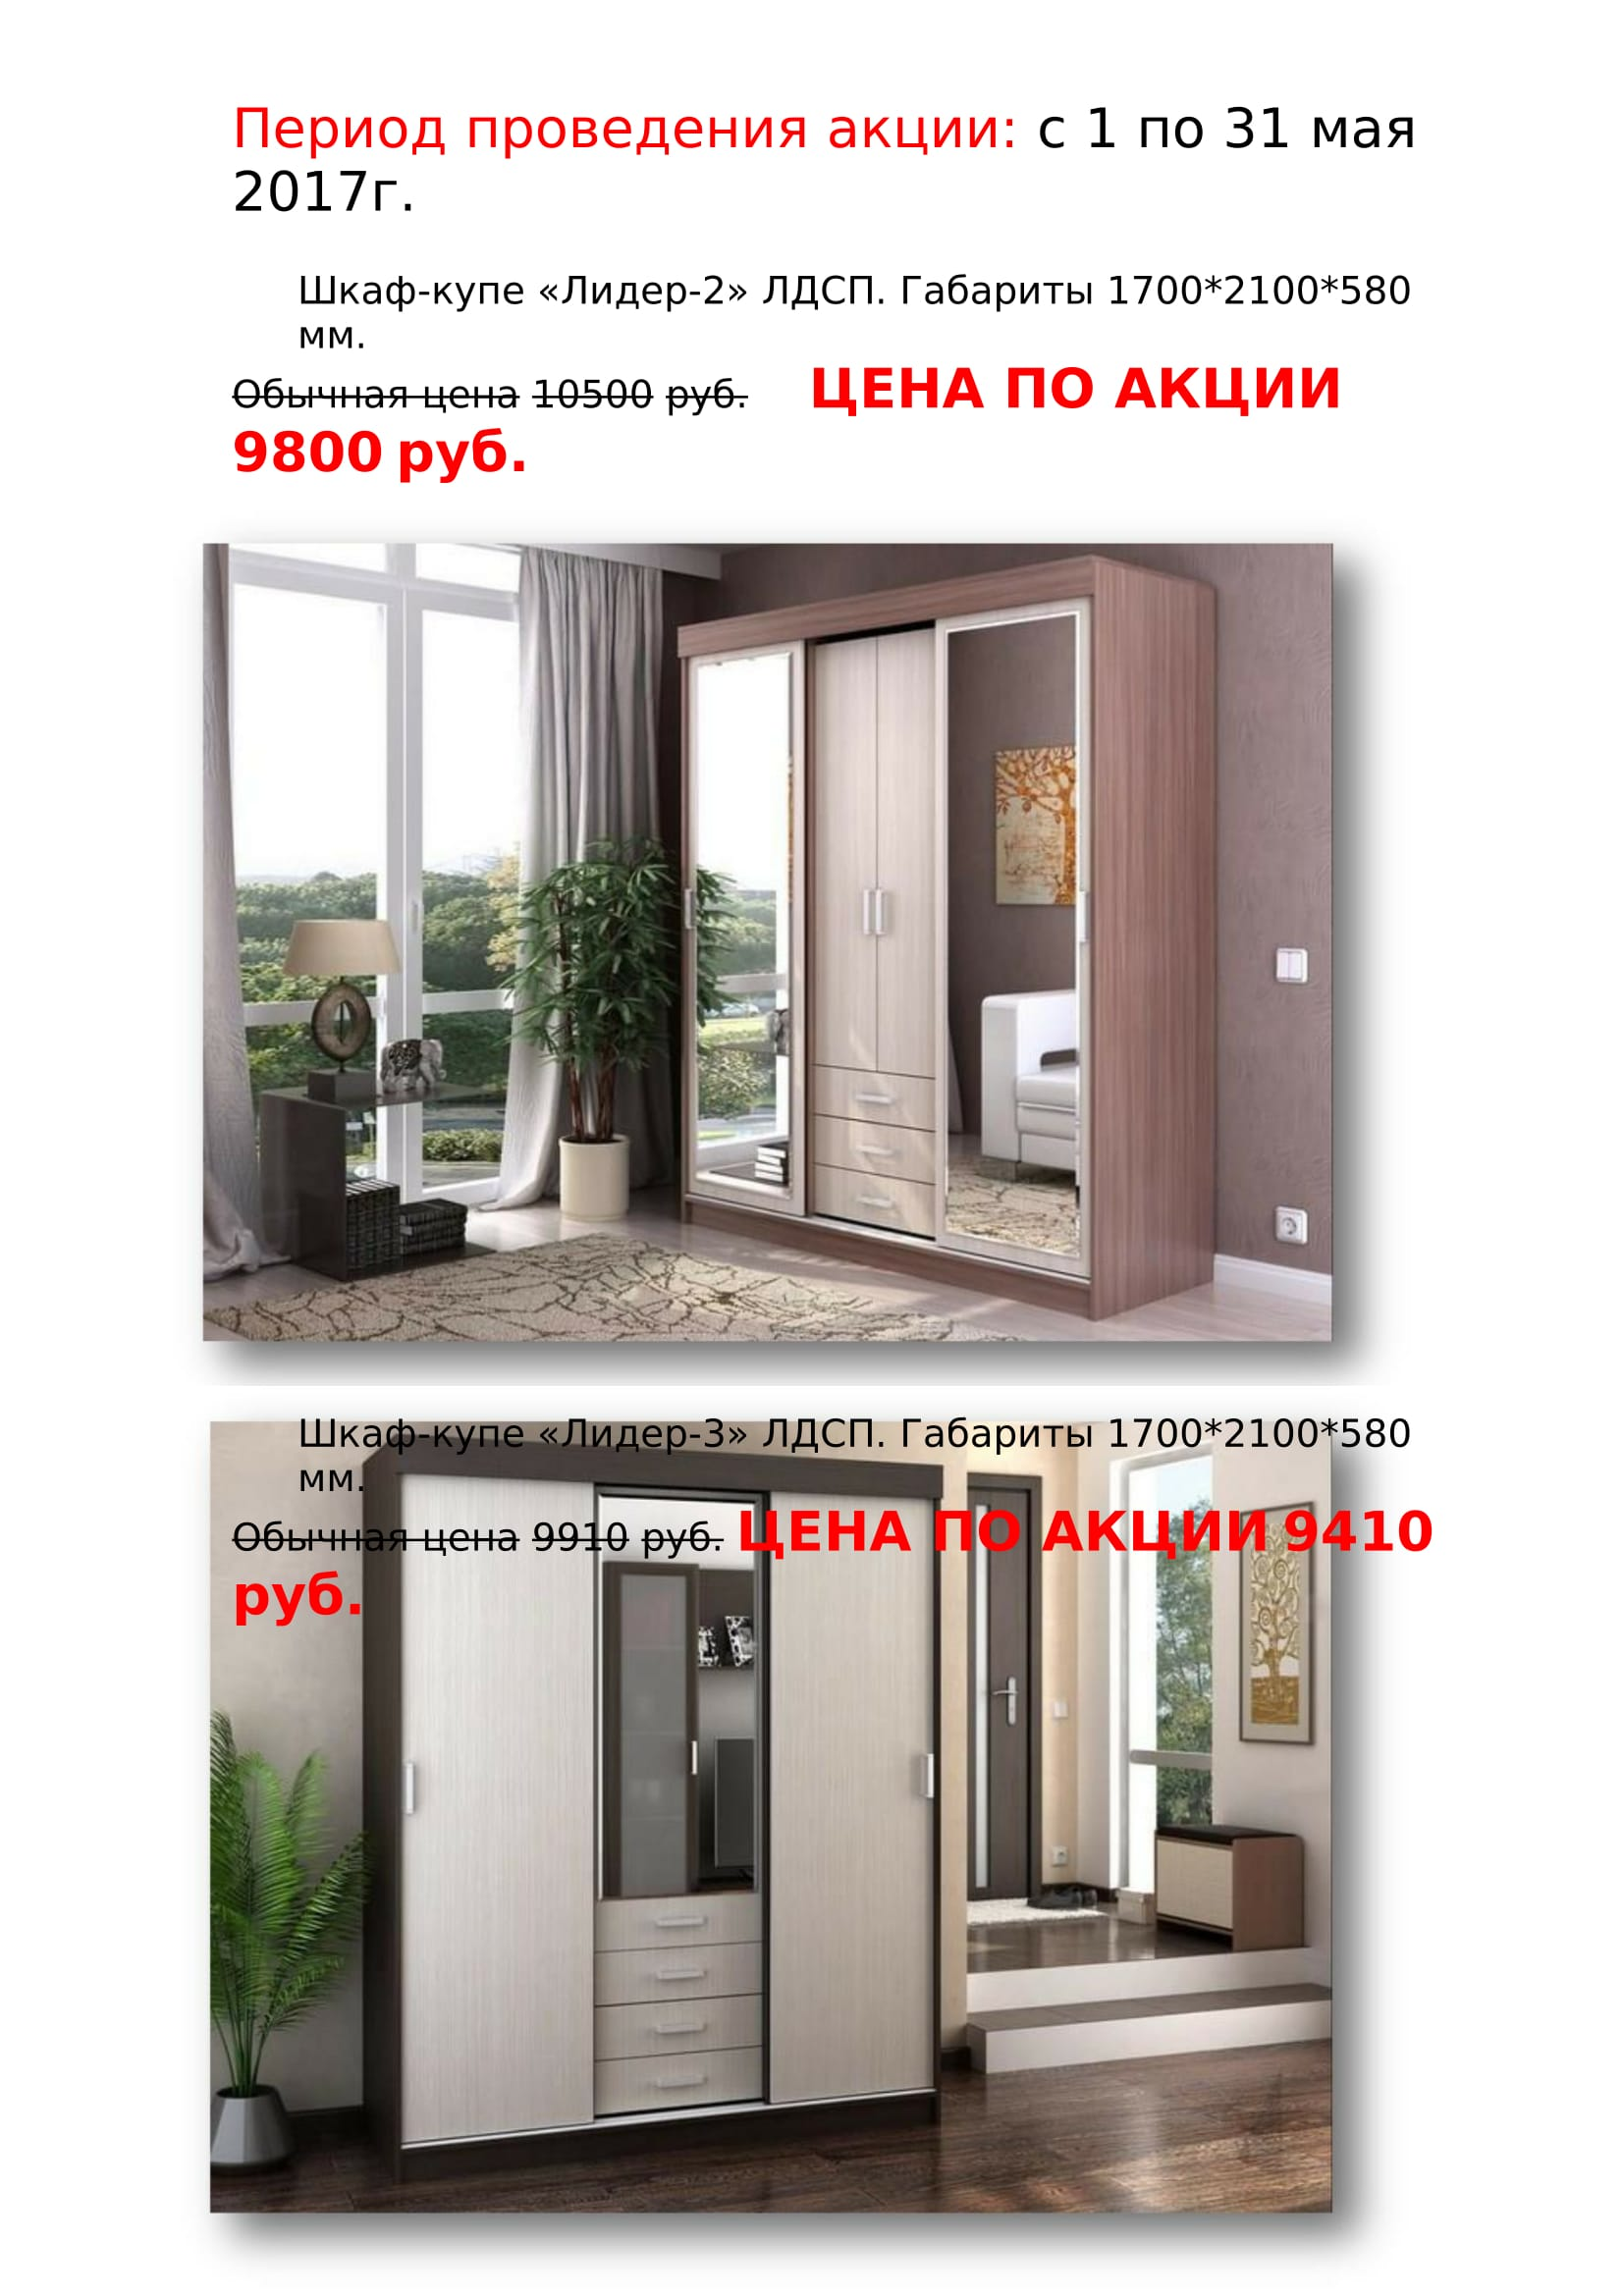 Акция СТЕНДМЕБЕЛЬ ШКАФЫ-4